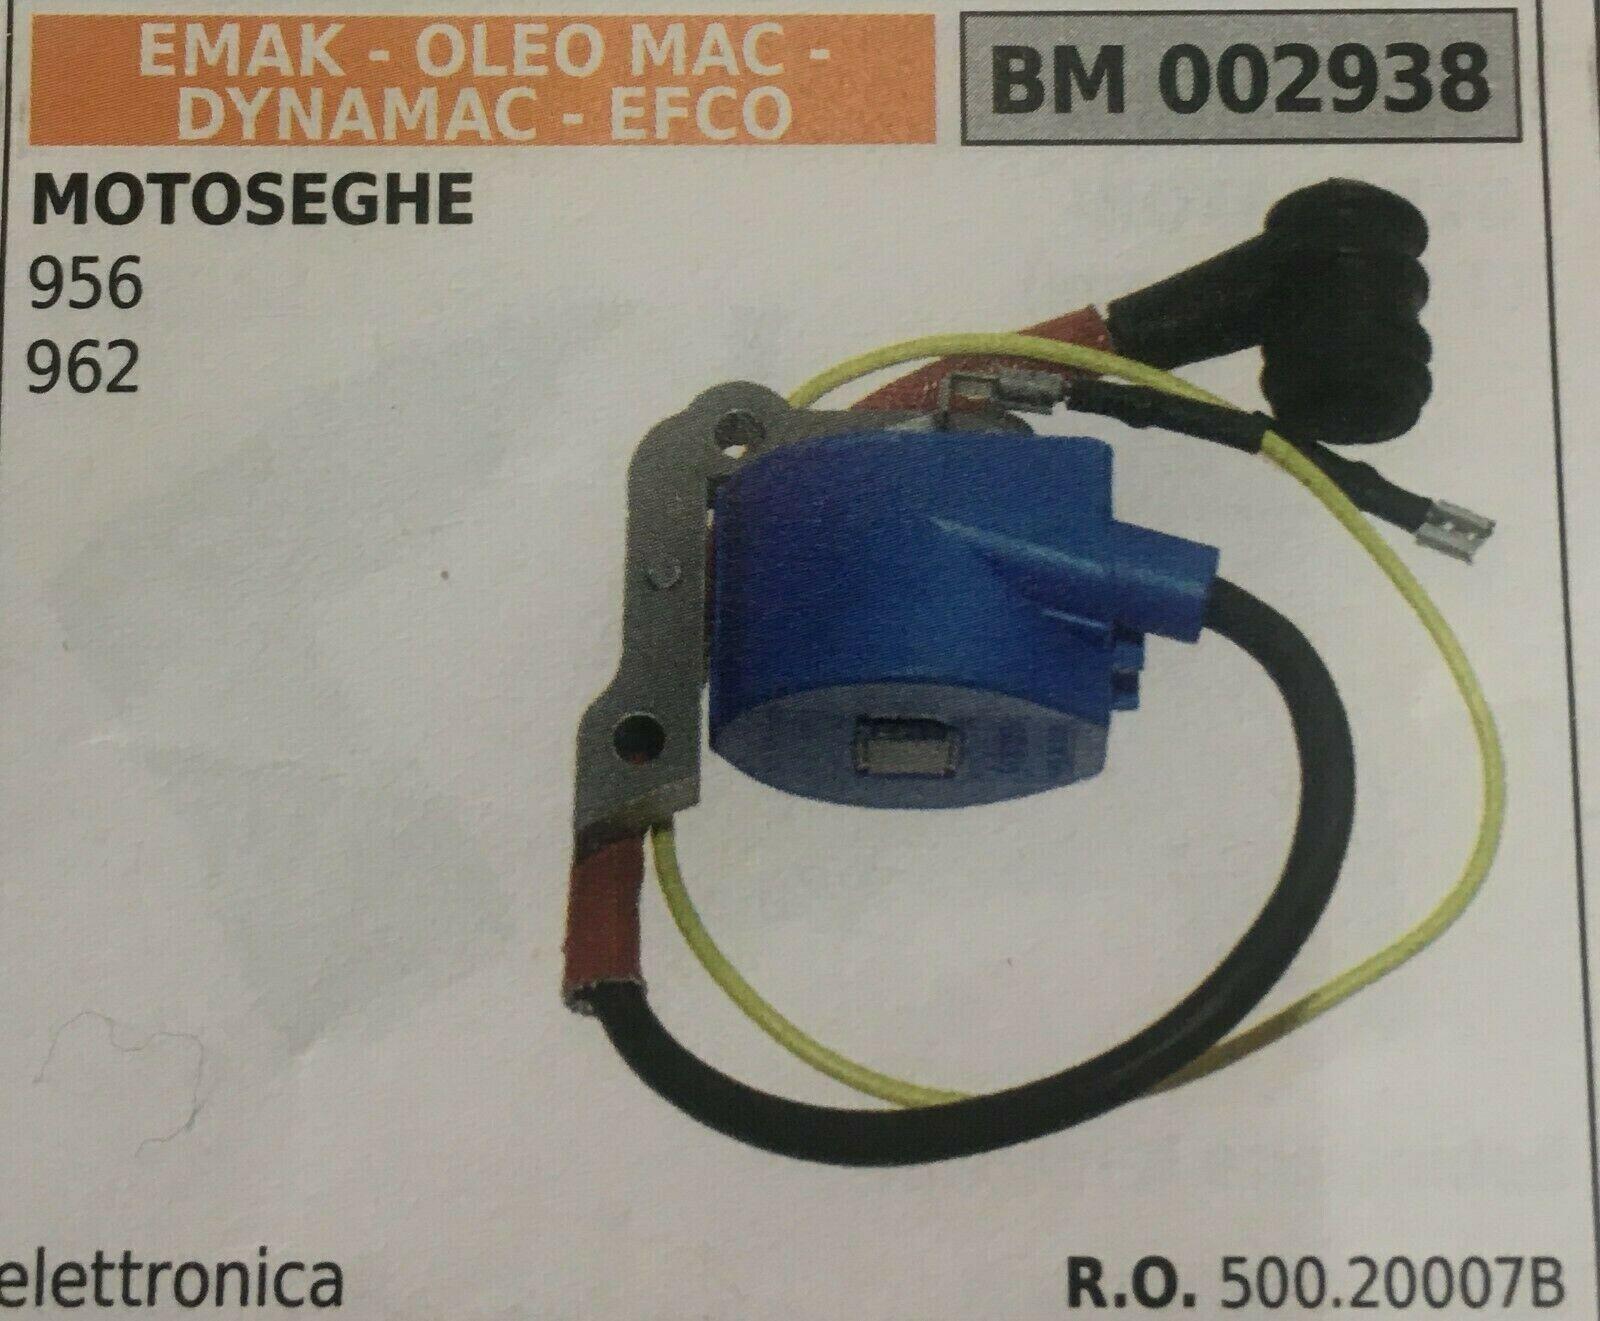 BOBINA ELETTRONICA EMAK OLEO MAC - DYNAMAC - EFCO BM 002938